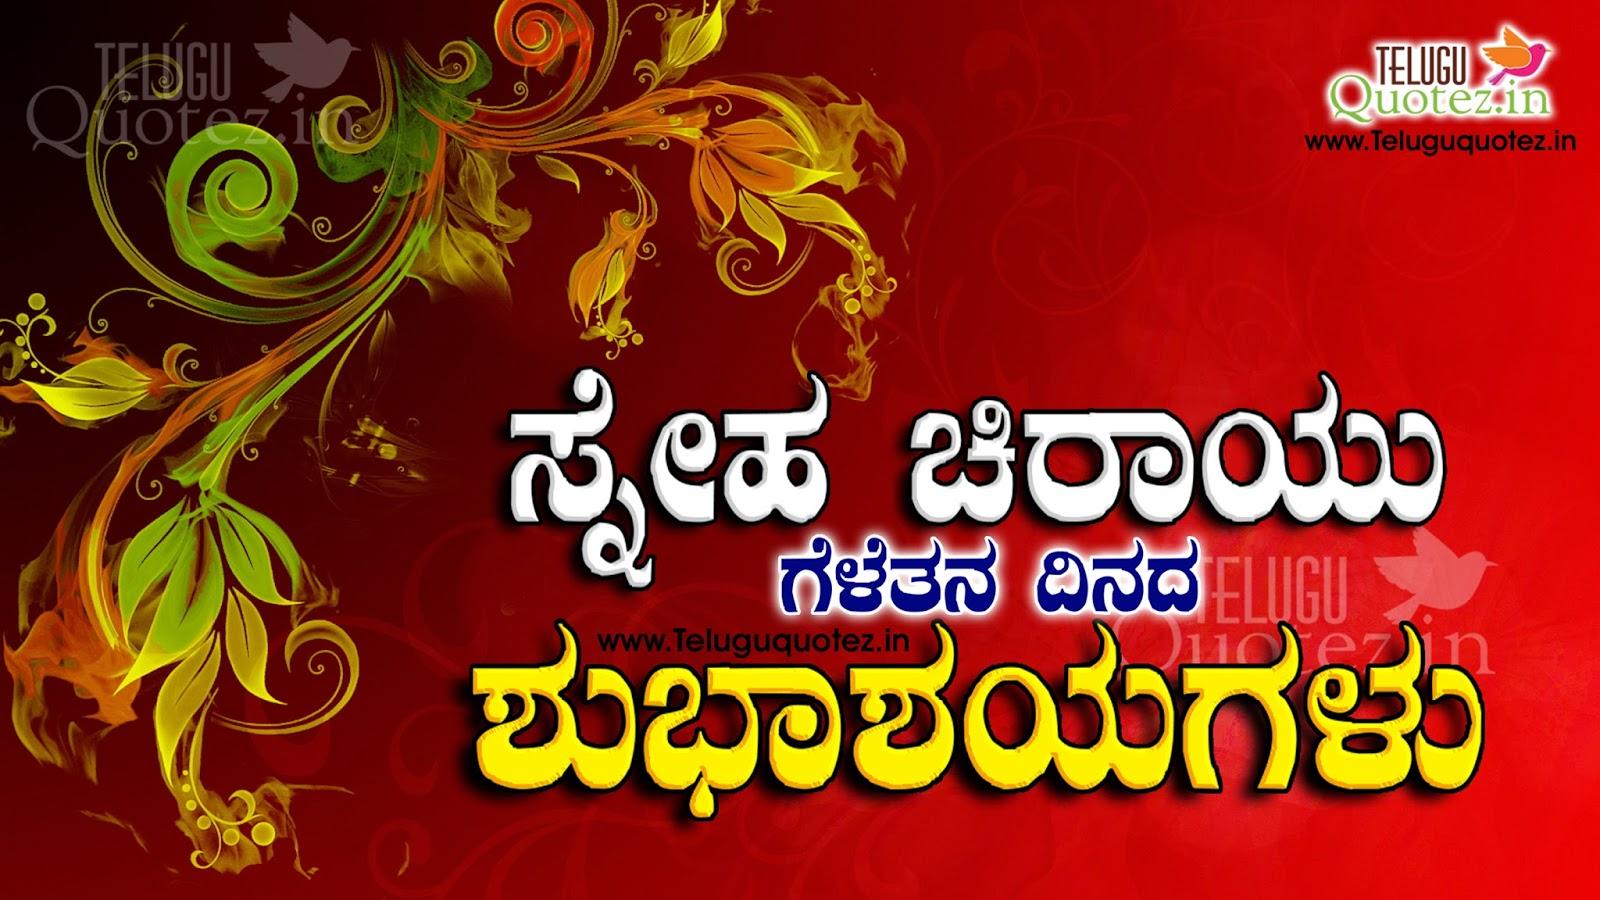 Kannada happy friendship day kavanagal quotes teluguquotez